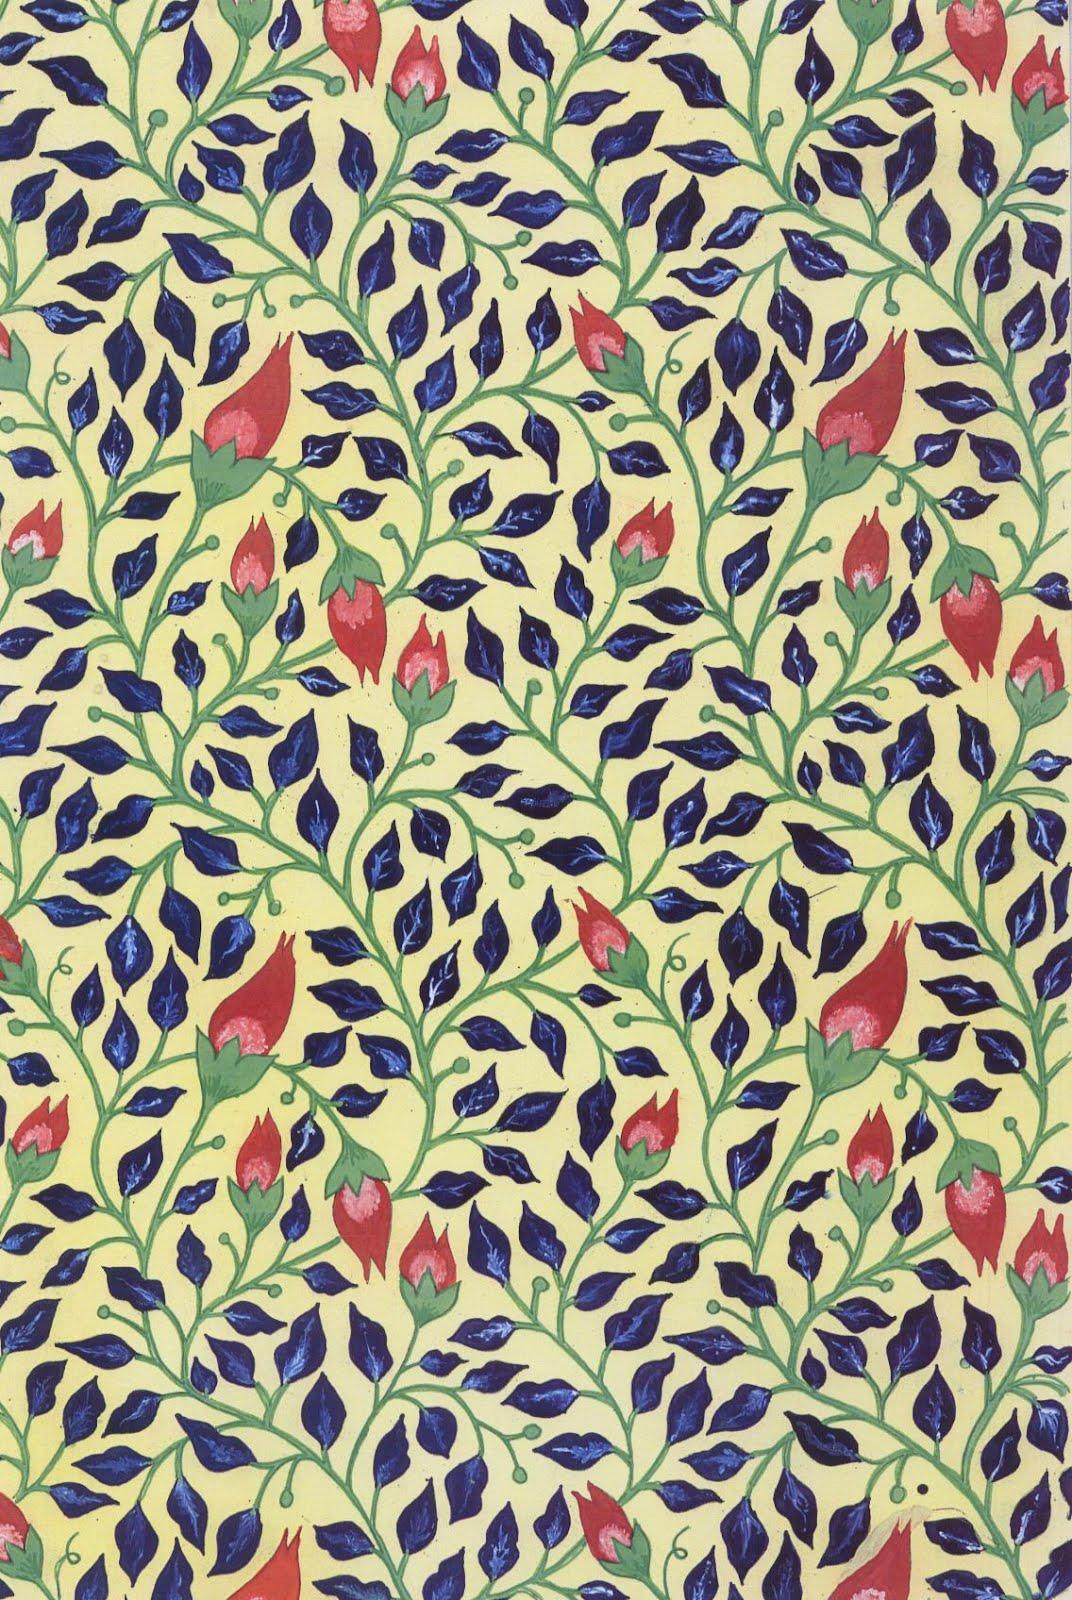 prints textile pretty gift inspiration floral education patterns